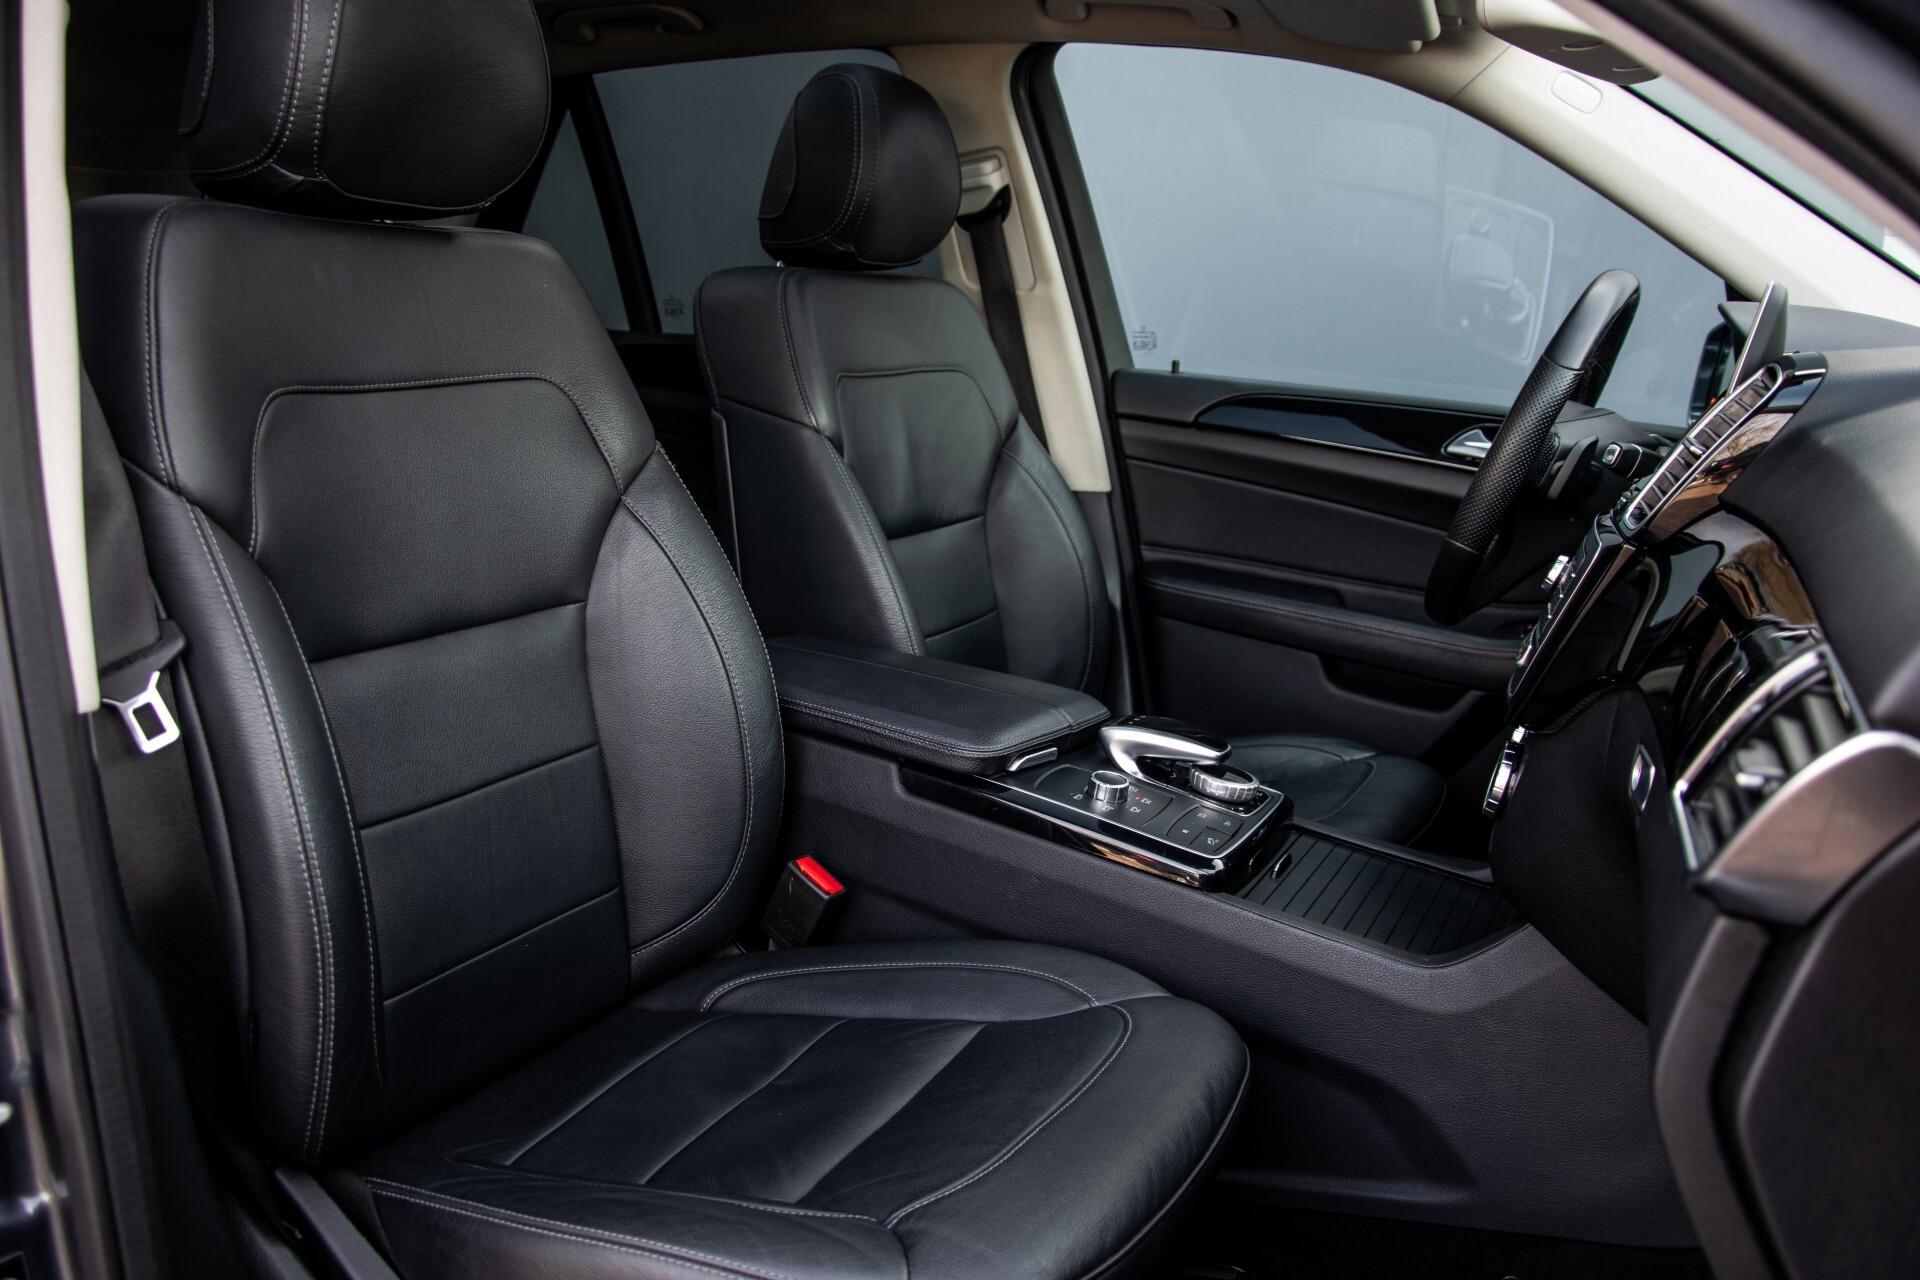 Mercedes-Benz GLE 350 d 4-M AMG Active Curve System/Panorama/Standkachel/Harman-Kardon/Trekhaak Aut9 Foto 3